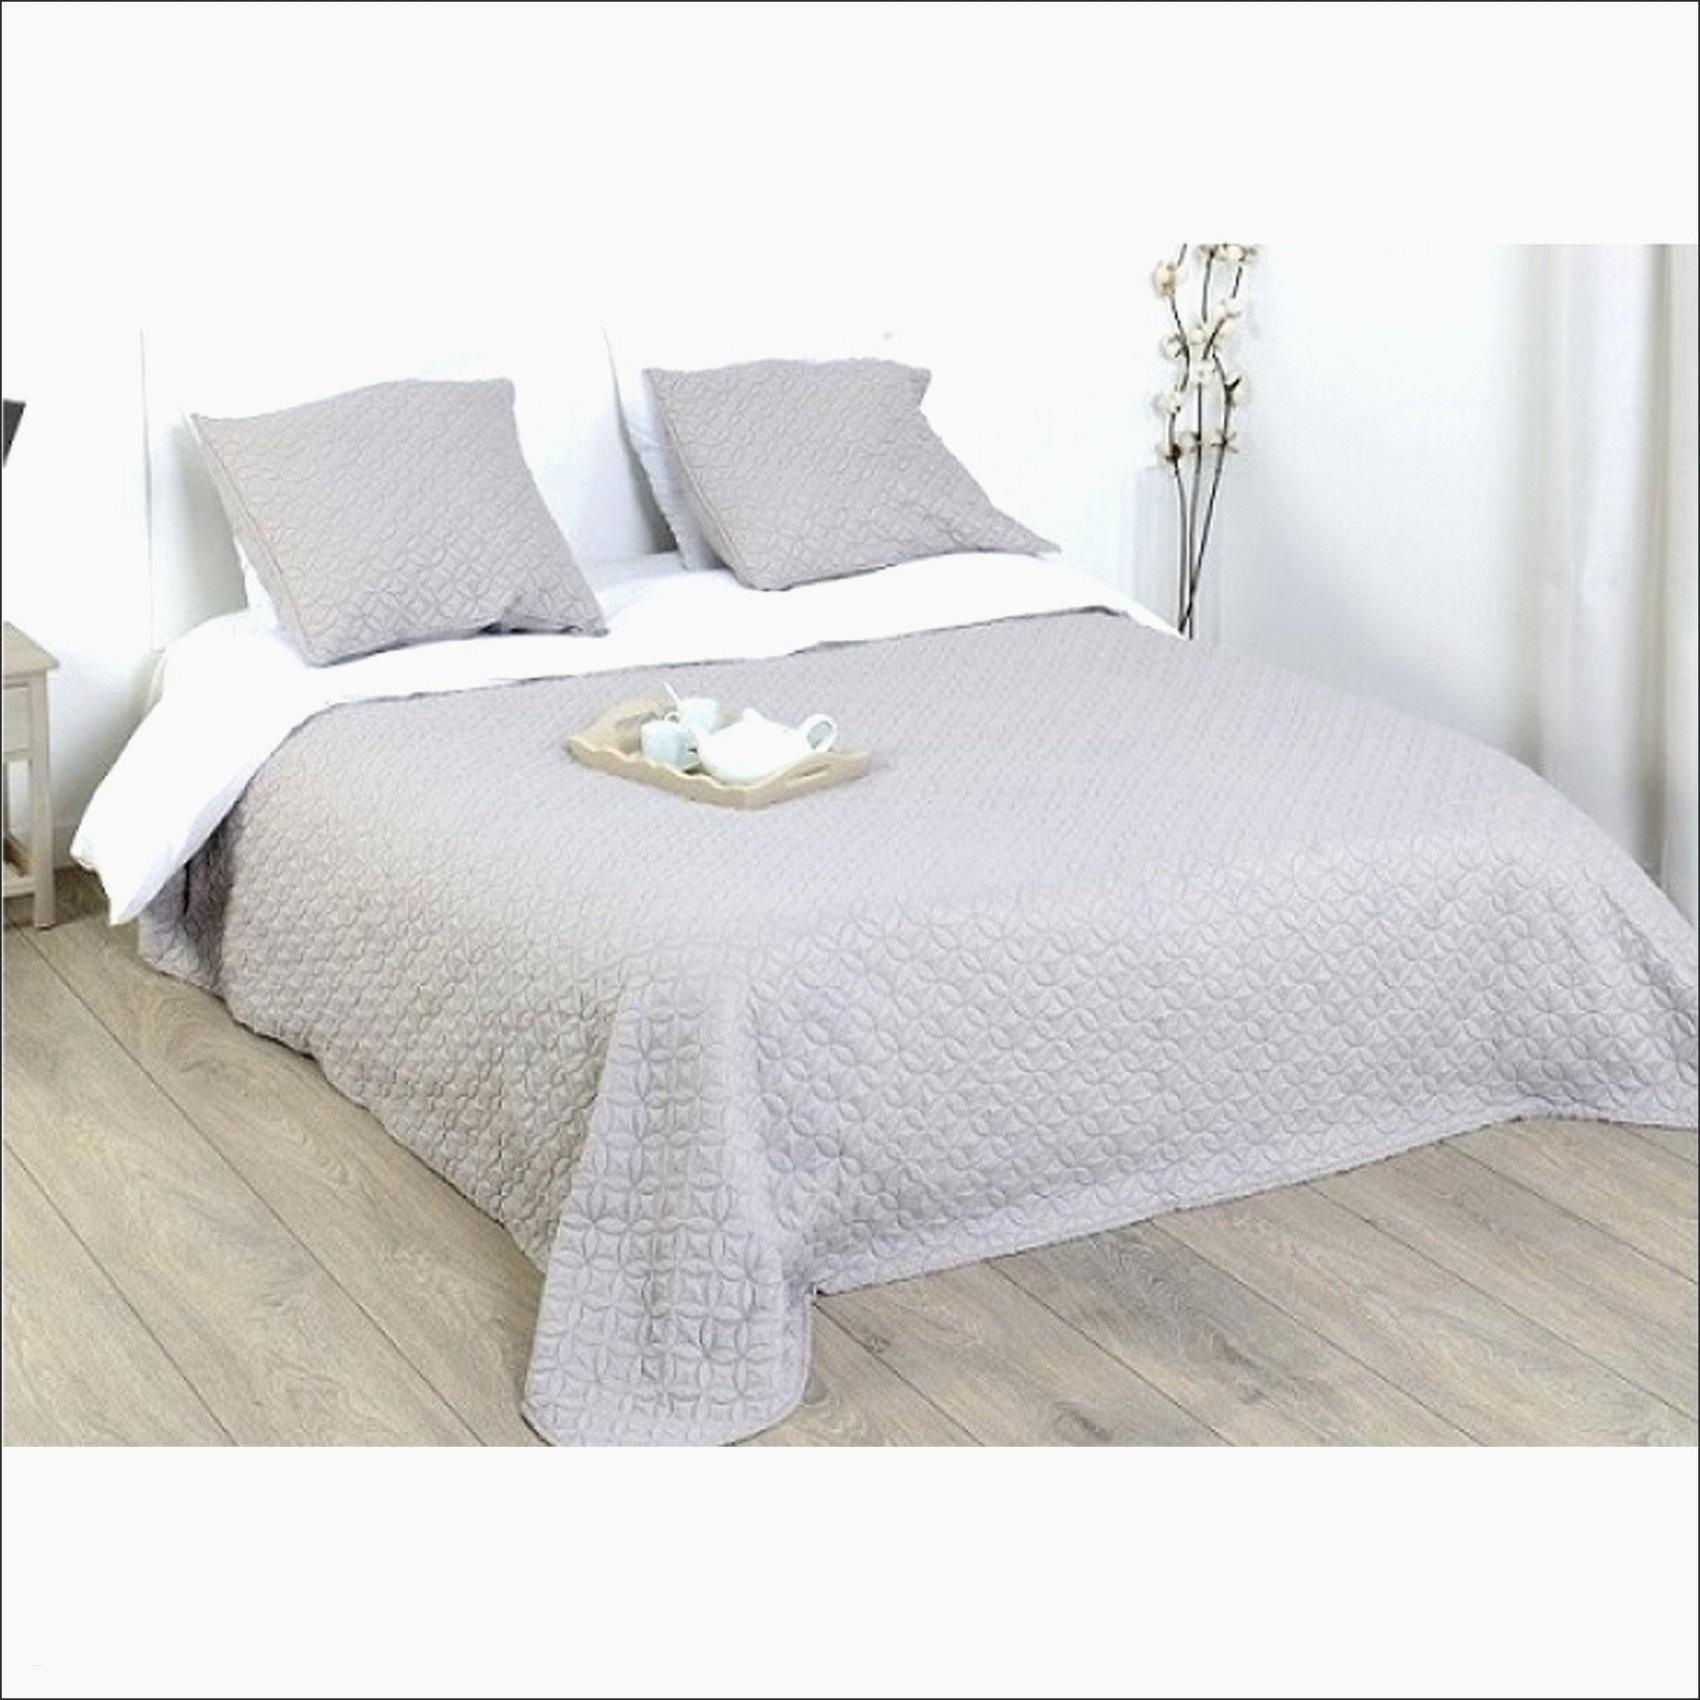 Tagesdecke Kinderbett Stark Bett Wei 200X200 Affordable Wei X Bett von Tagesdecke Bett 200X200 Photo